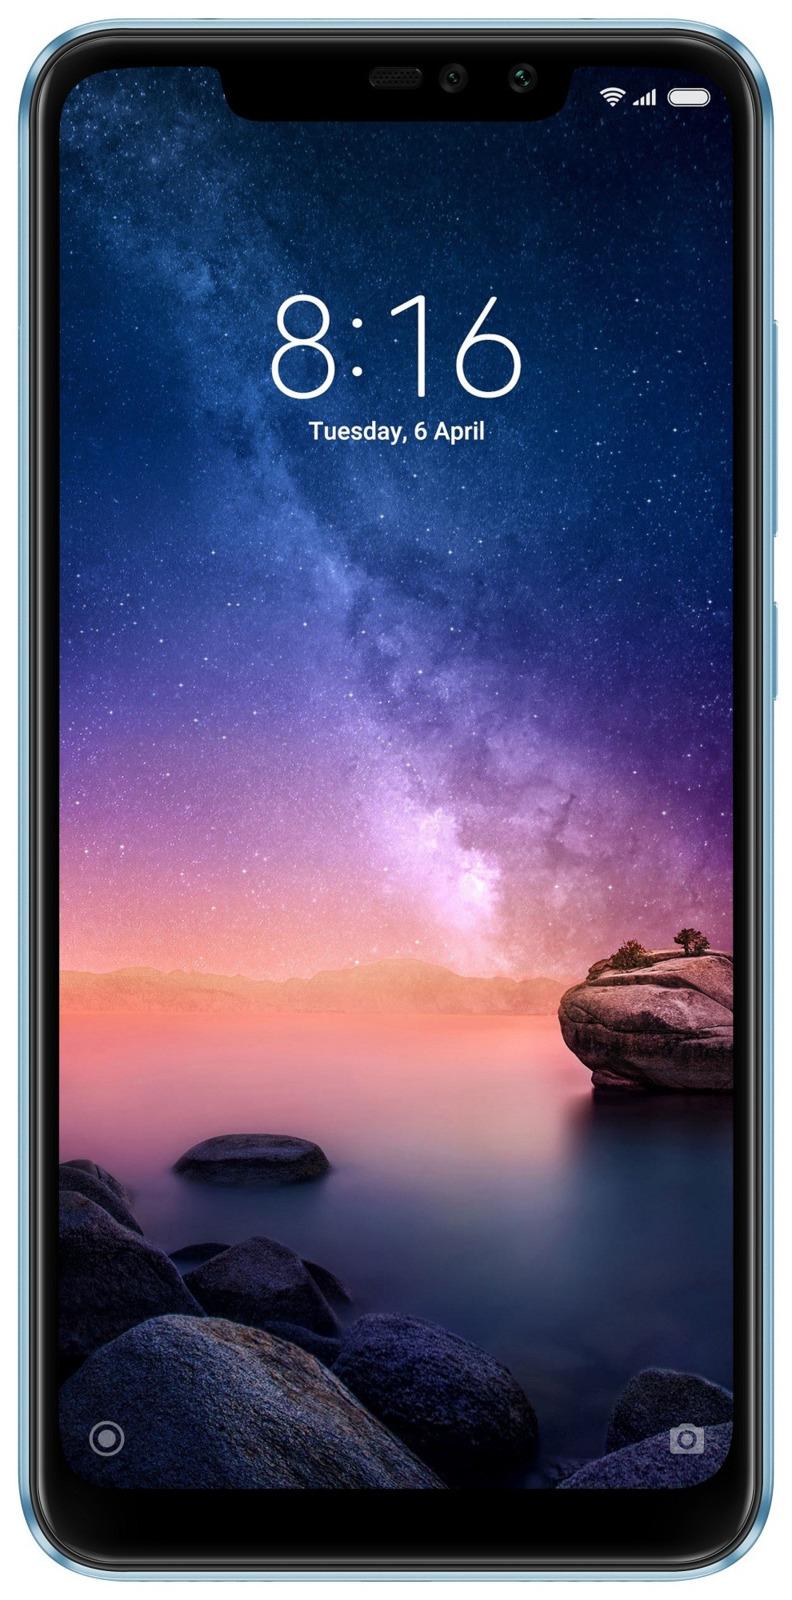 лучшая цена Смартфон Xiaomi Redmi Note 6 Pro 4/64GB, синий